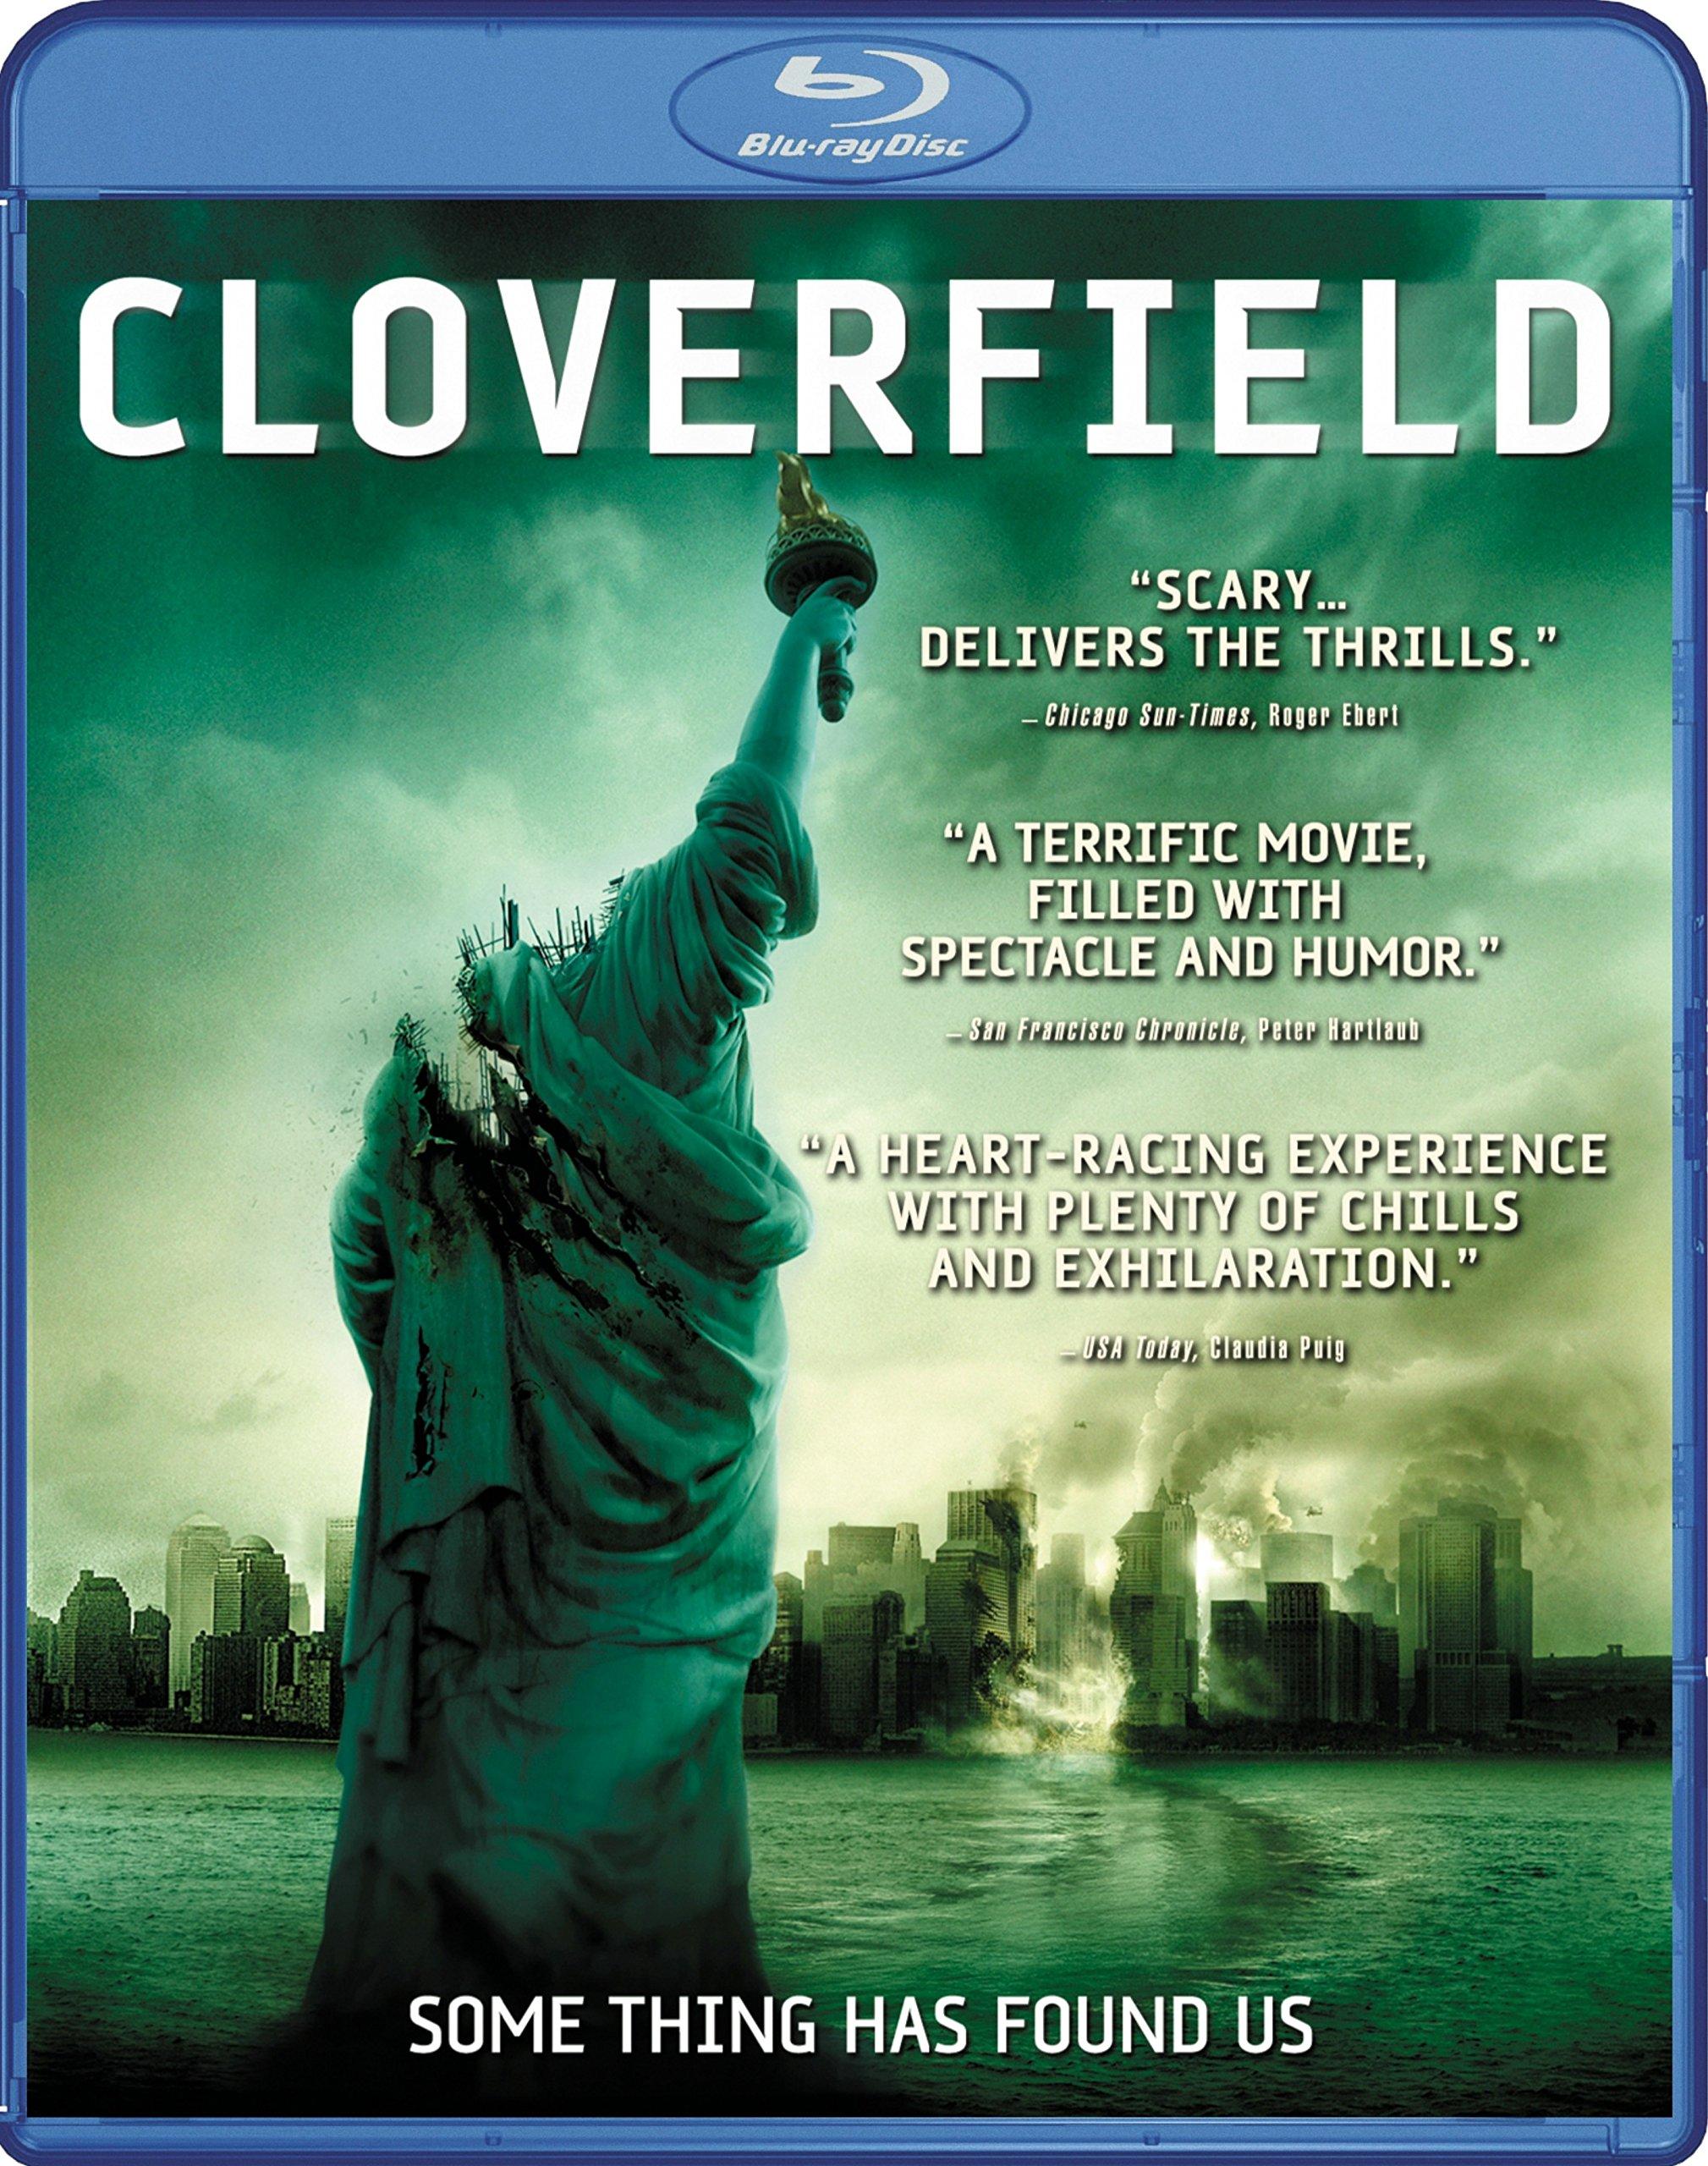 Blu-ray : Cloverfield (Blu-ray)